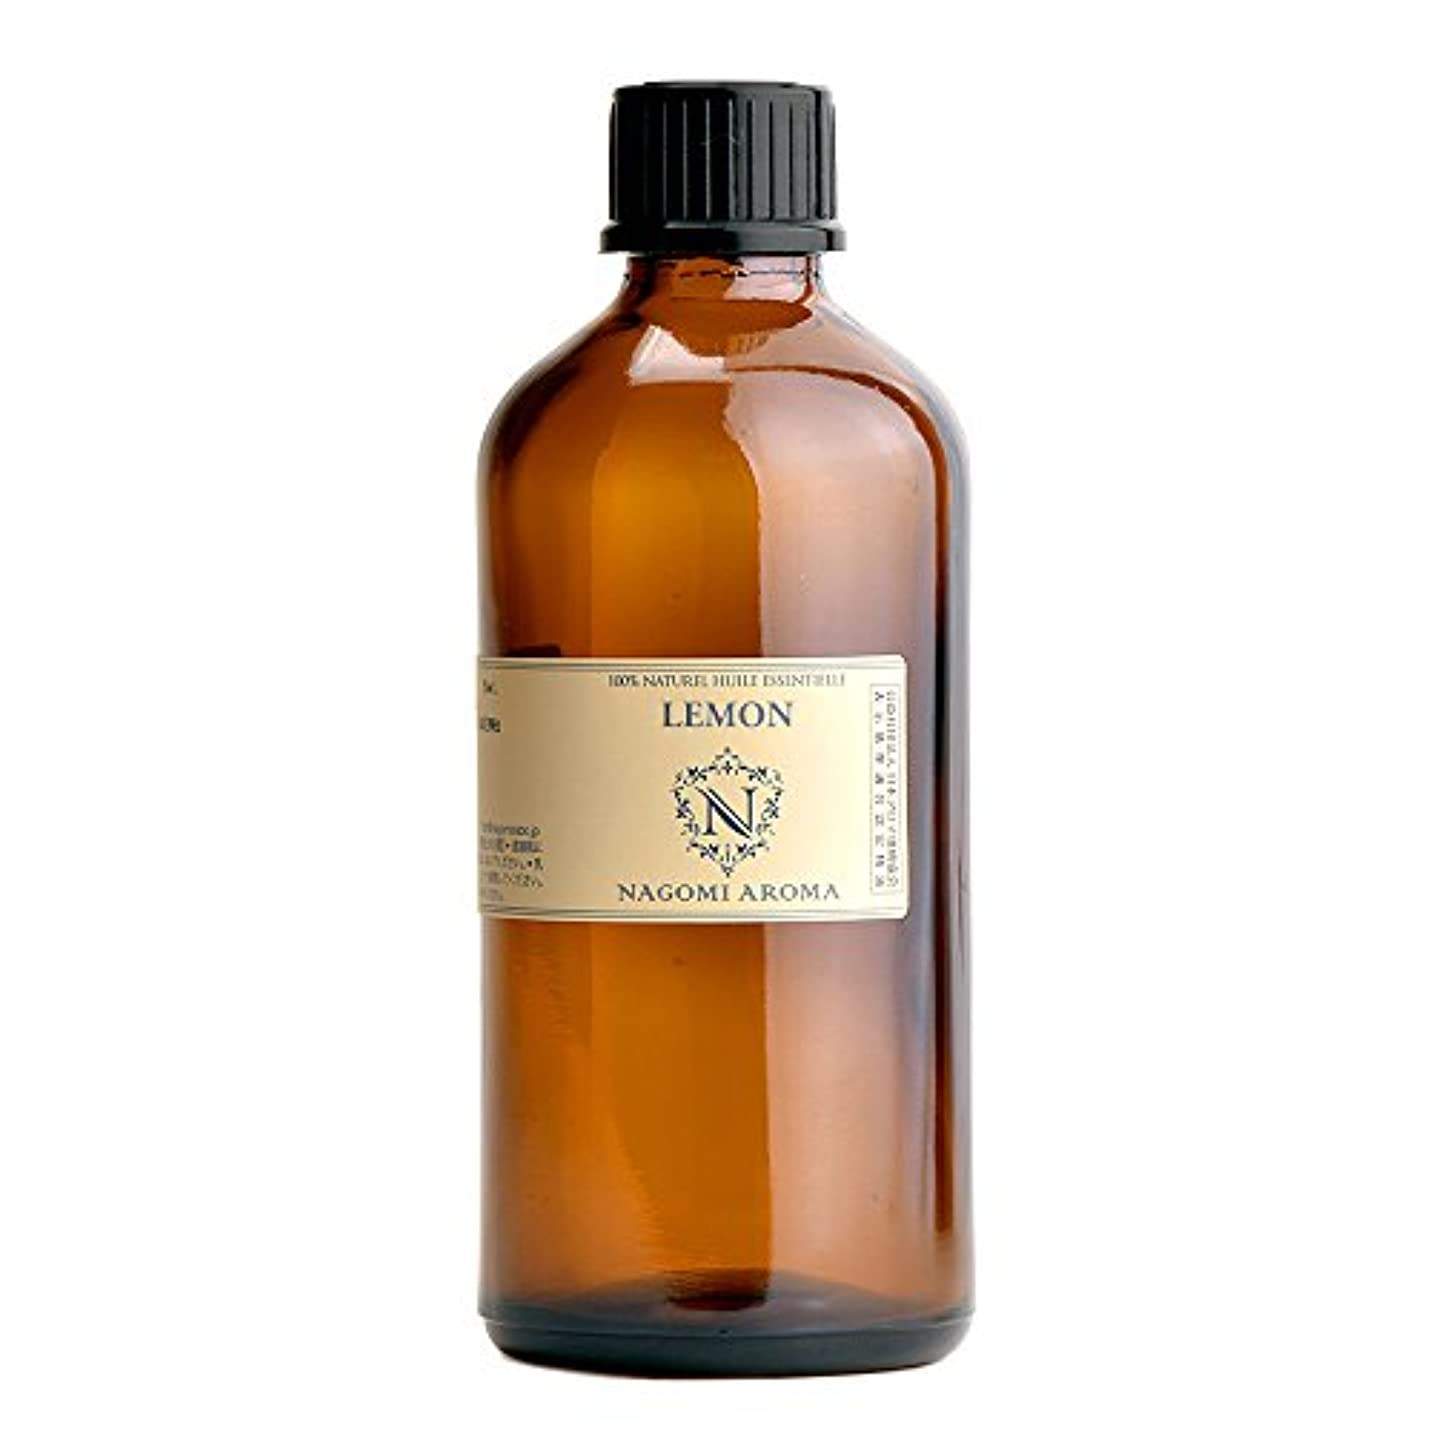 NAGOMI AROMA レモン 100ml 【AEAJ認定精油】【アロマオイル】